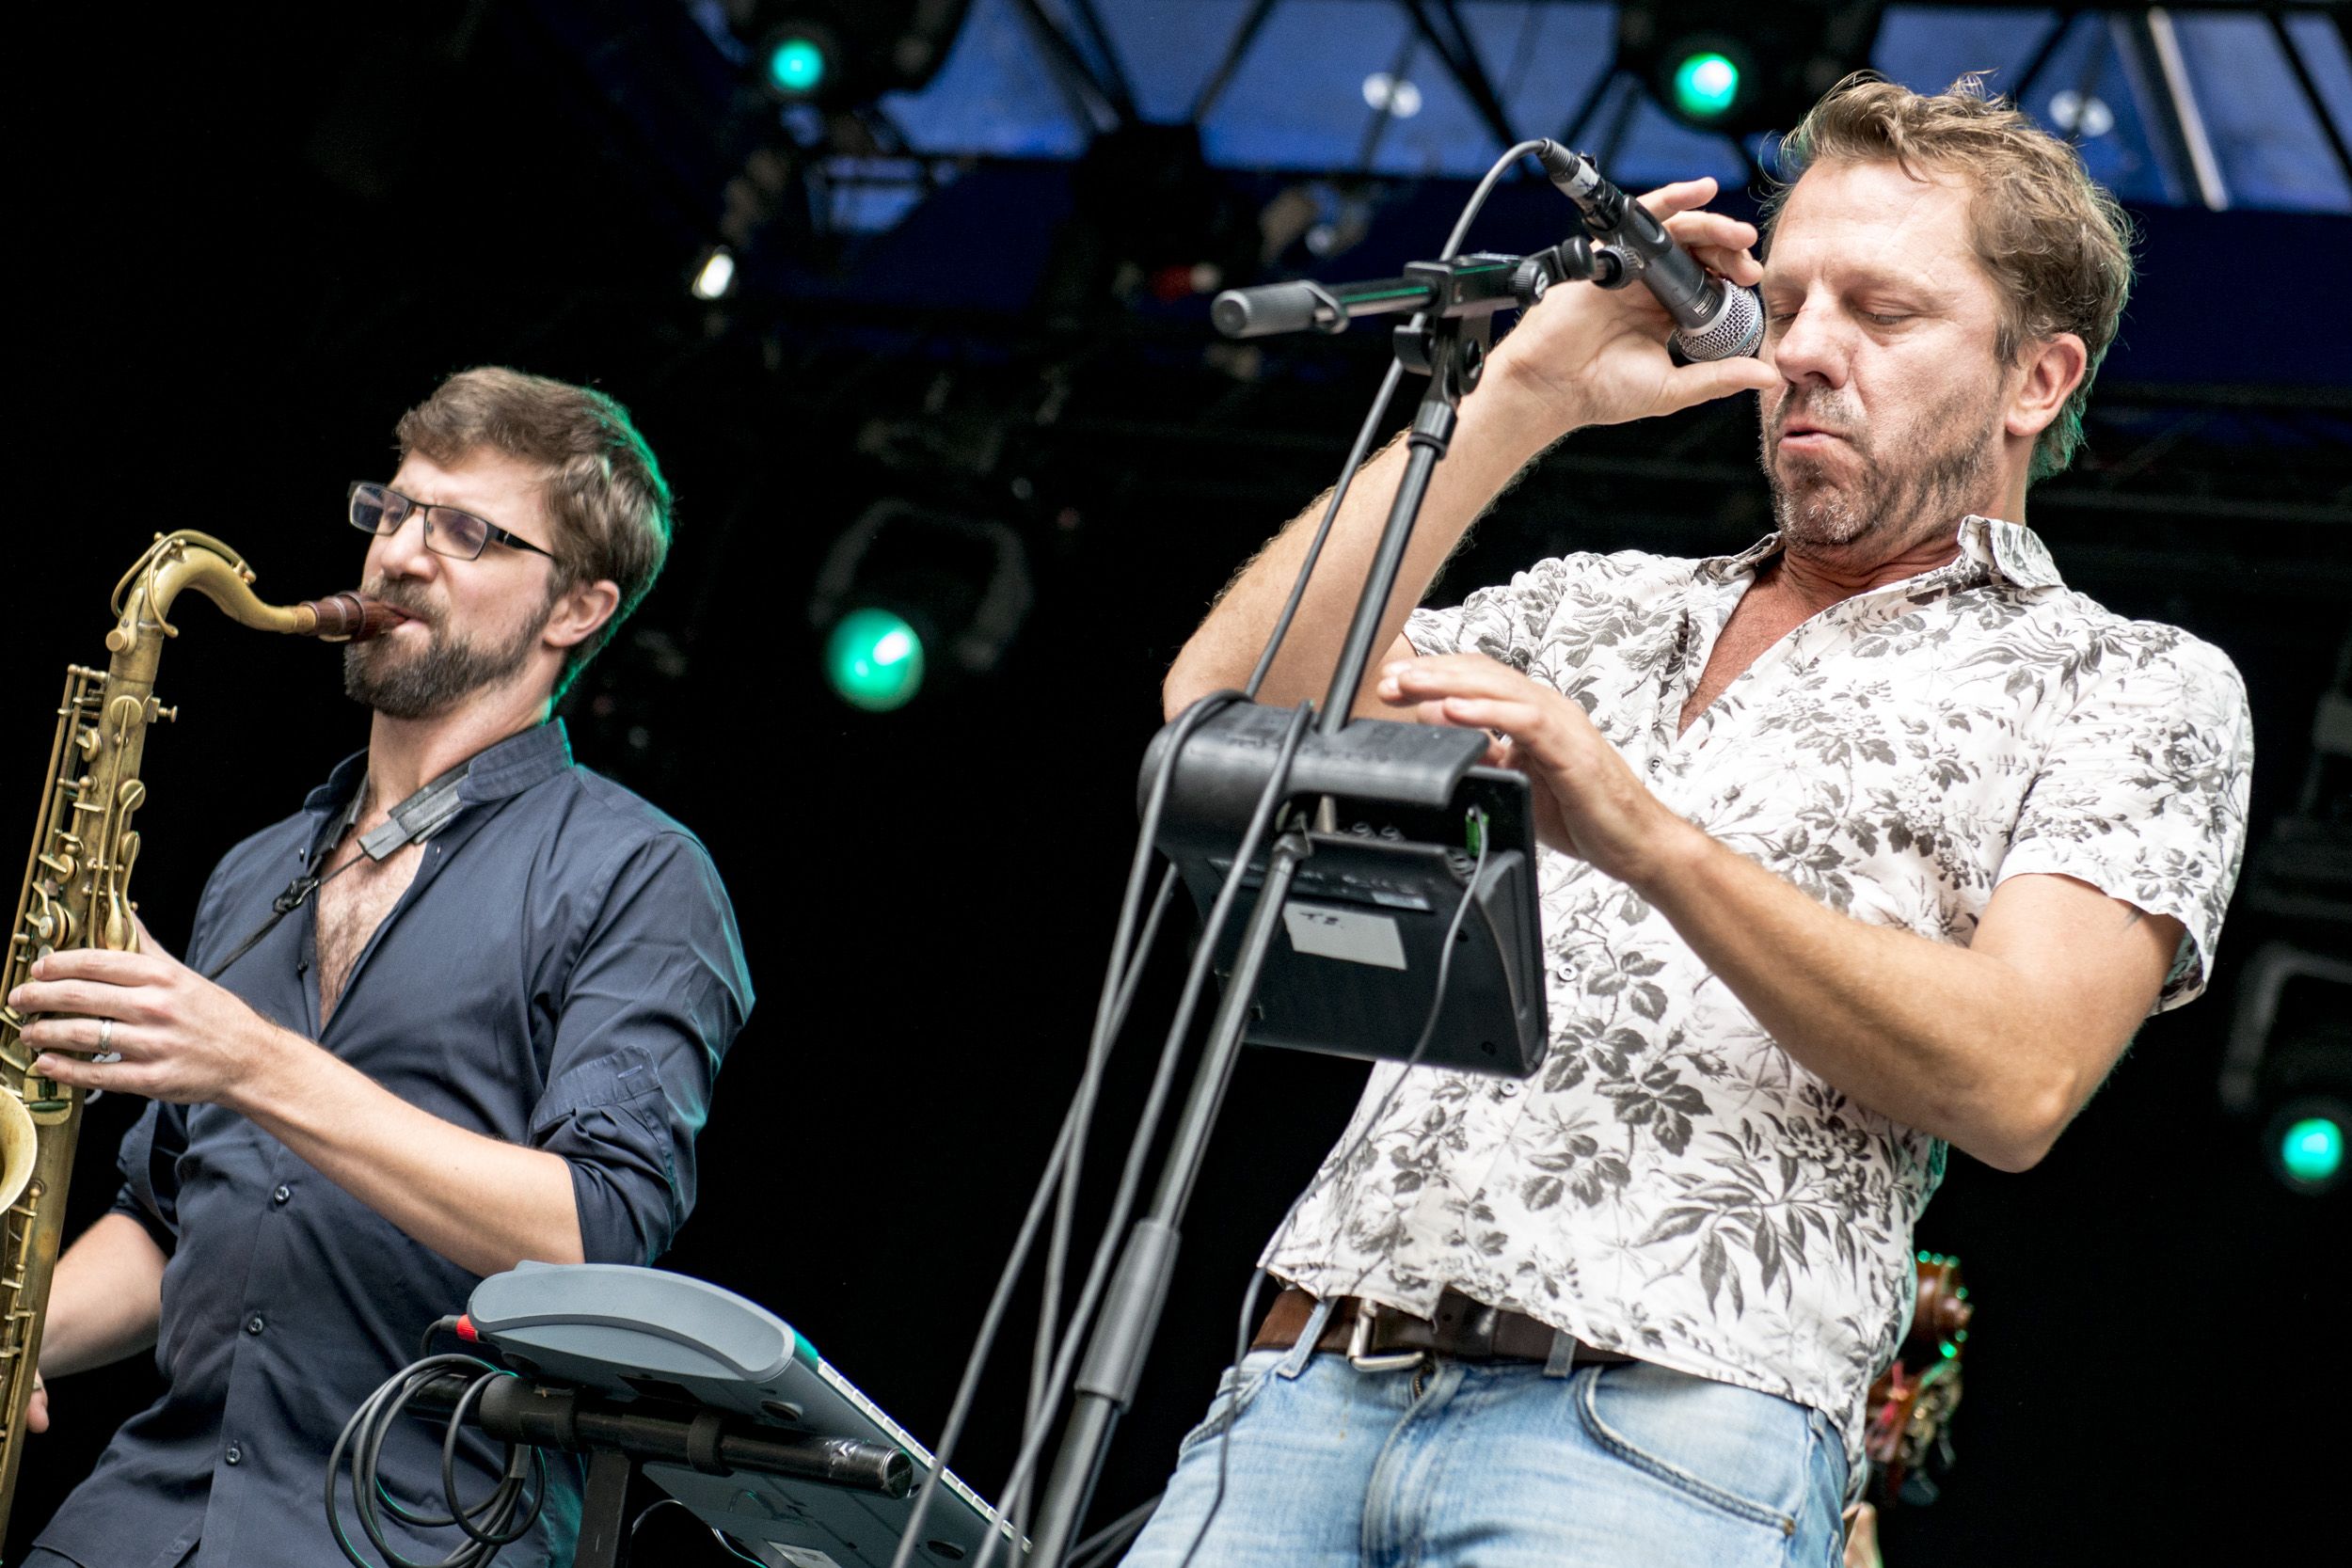 Taxiwars @ Cactusfestival 2017, Dag 2 (Nick De Baerdemaeker)